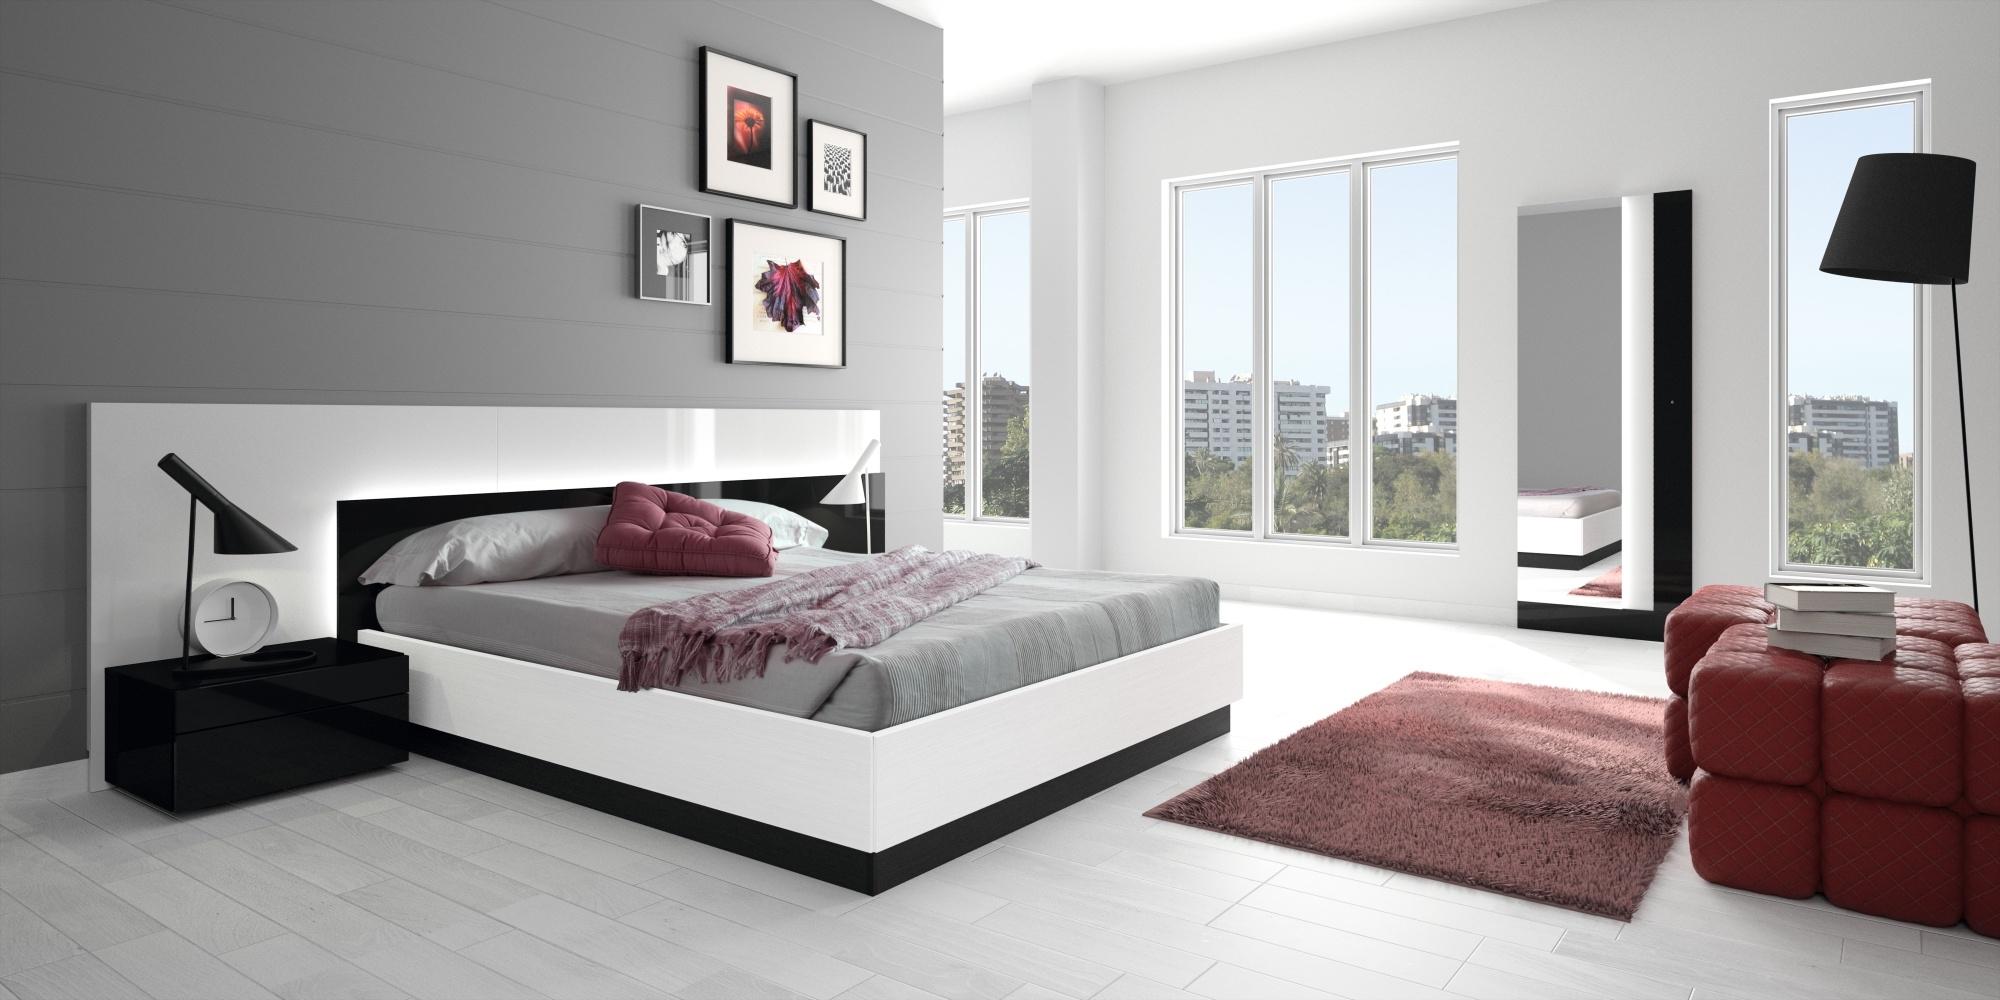 Modern Bedroom of Teenage Girl